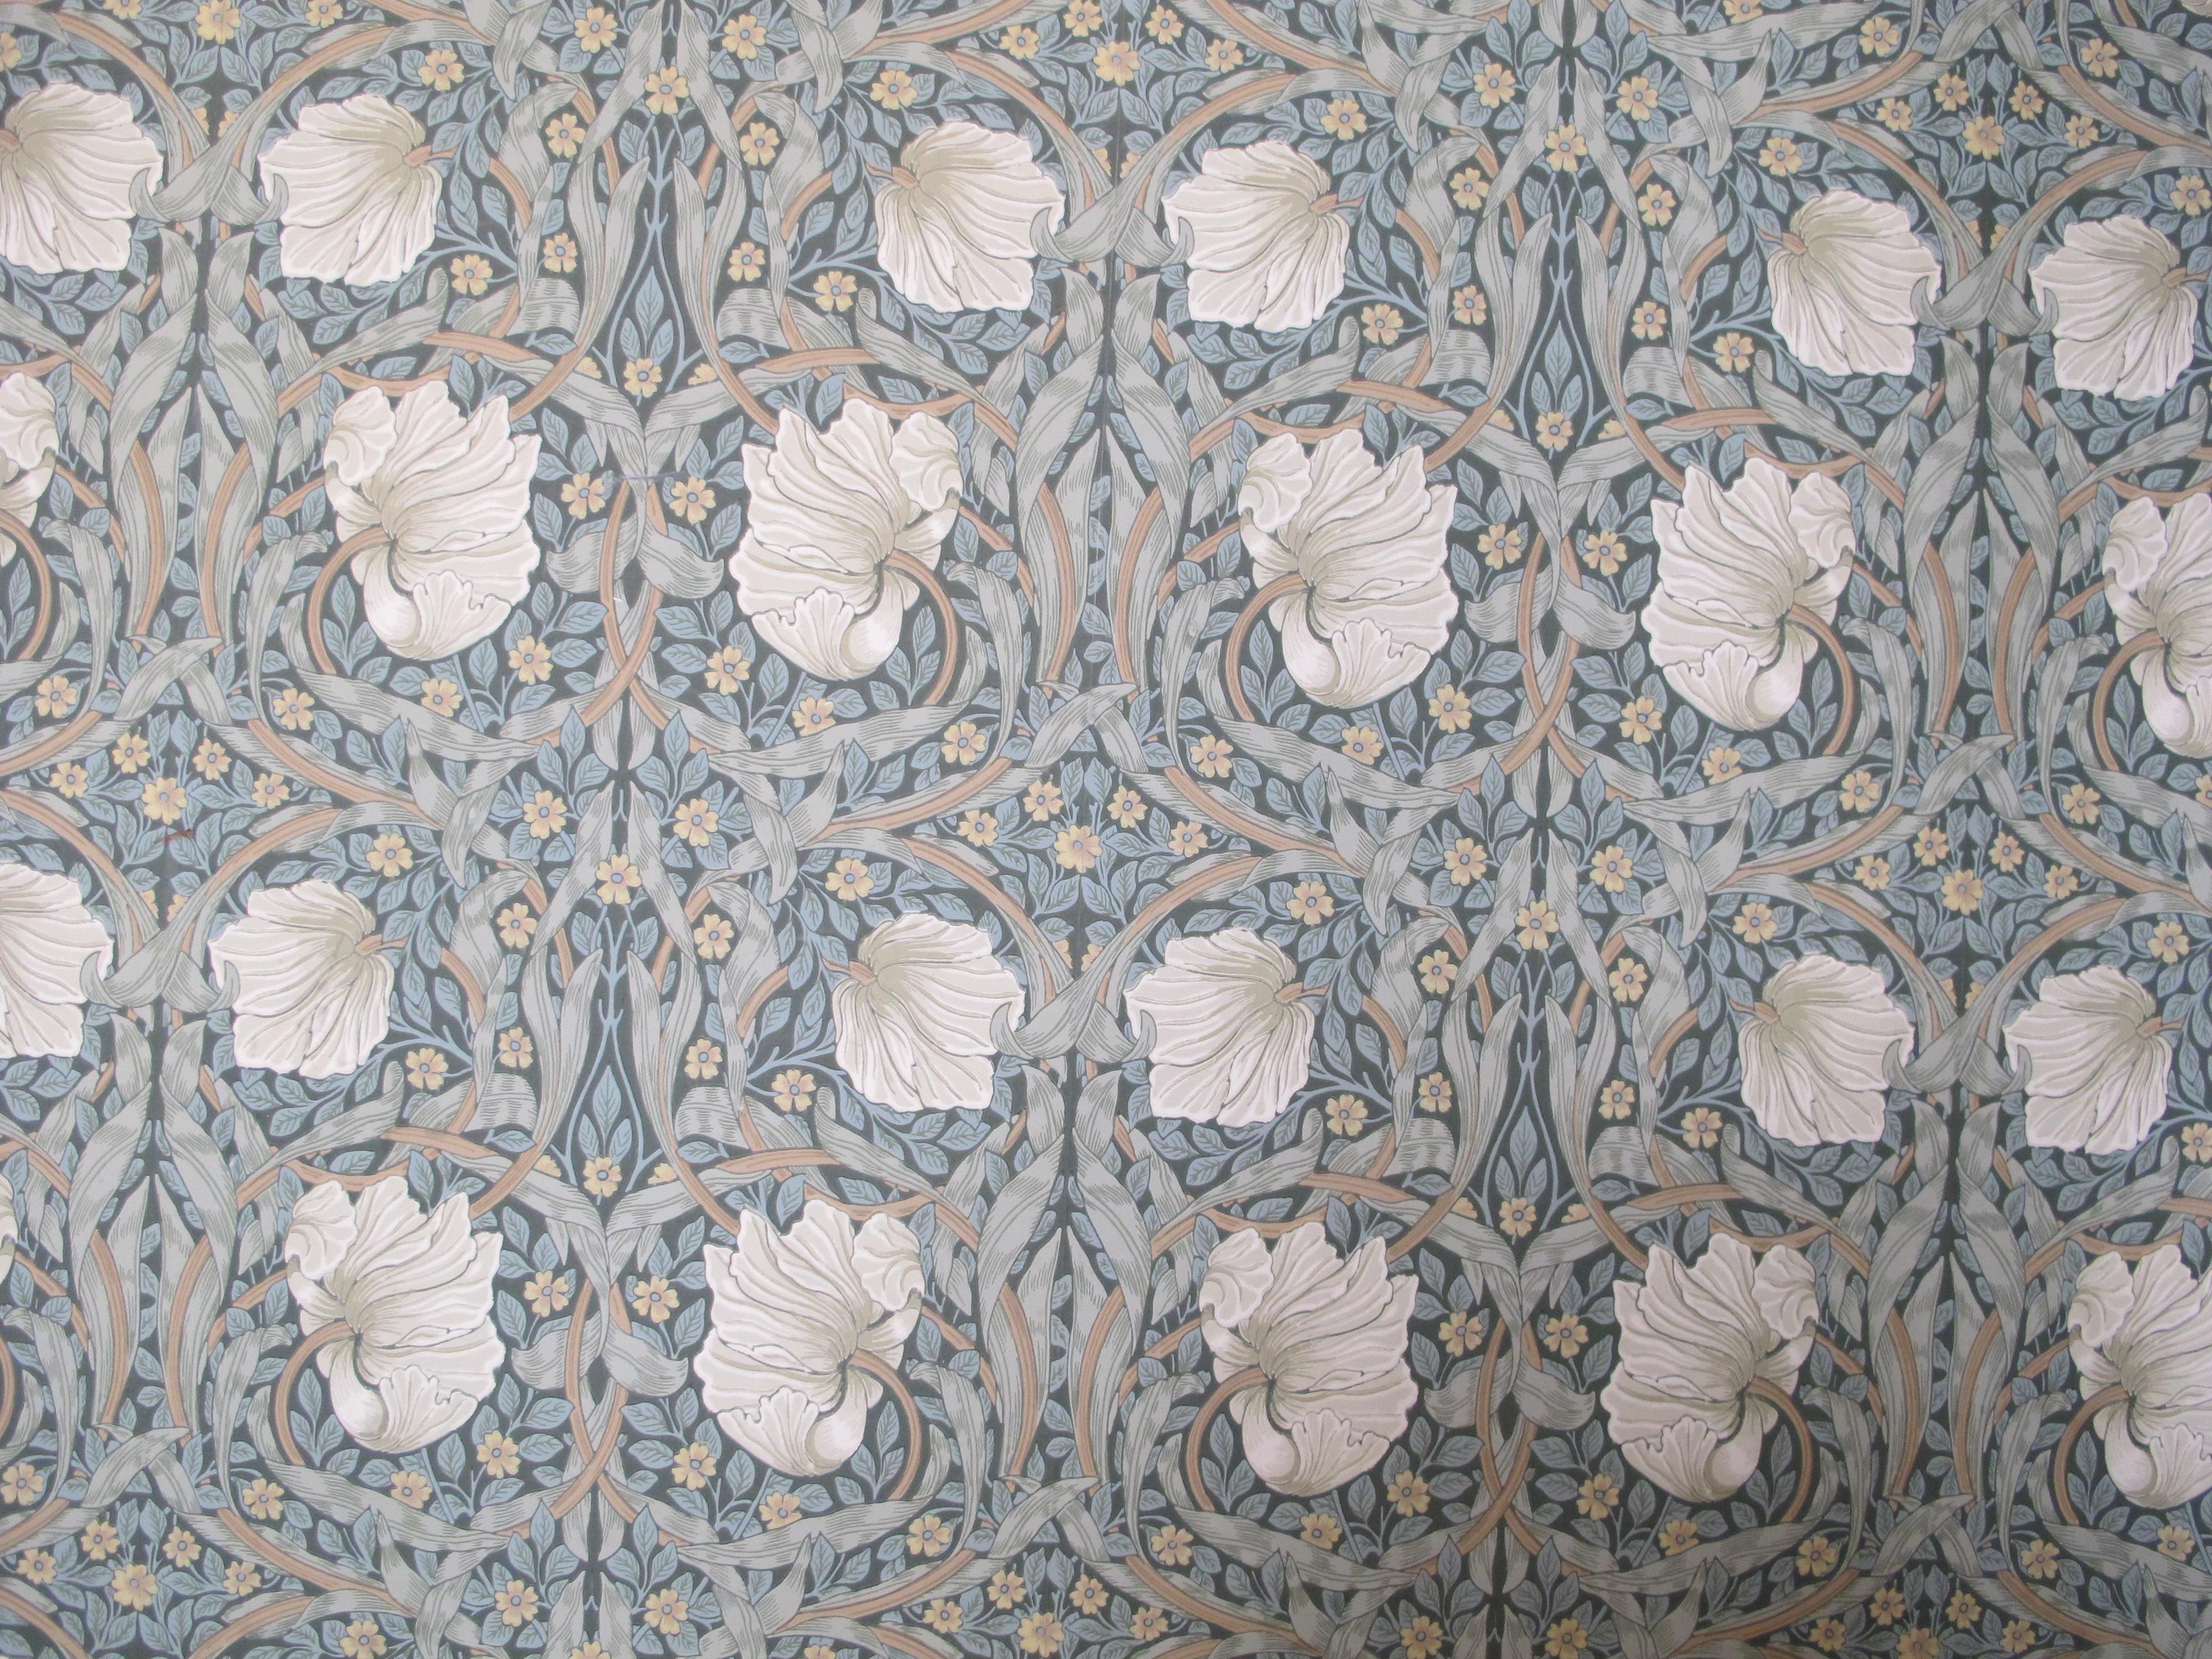 File:William Morris Pimpernel Wallpaper, Two Temple Place